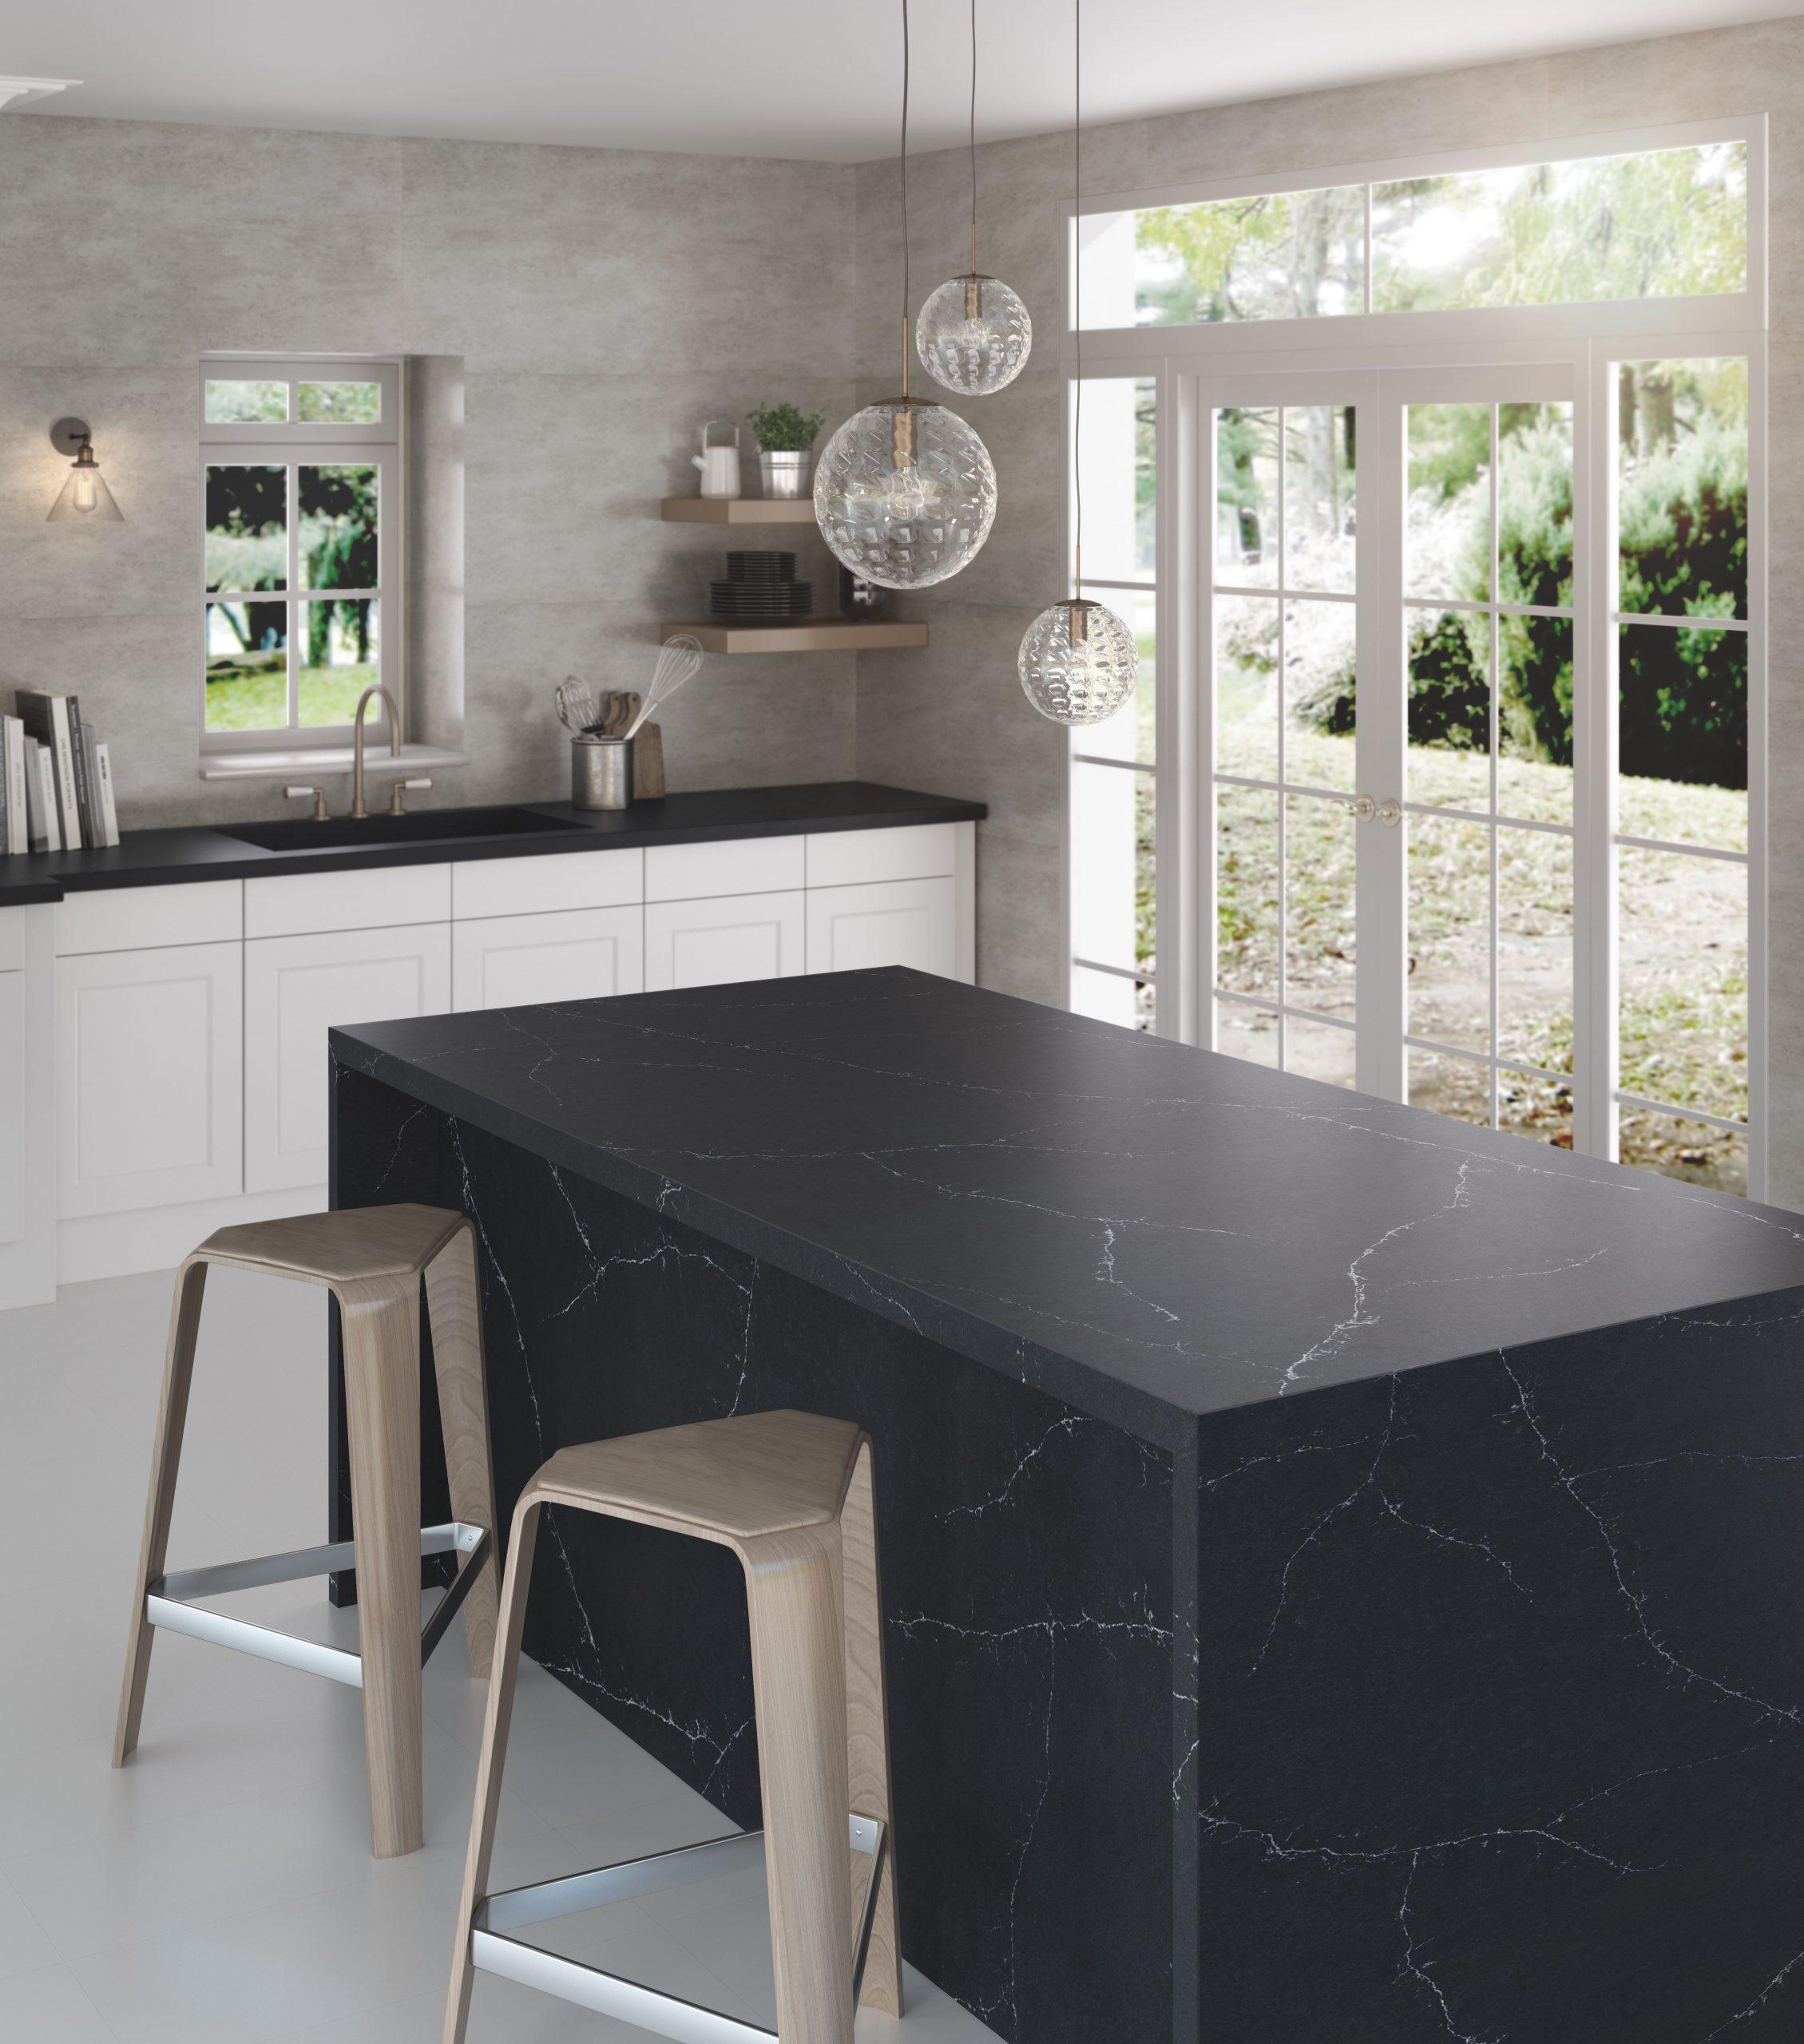 Full Size of Bodenbelag Küche Altbau Bodenbelag In Der Küche Boden Für Küche Küchenboden Ideen Küche Bodenbelag Küche